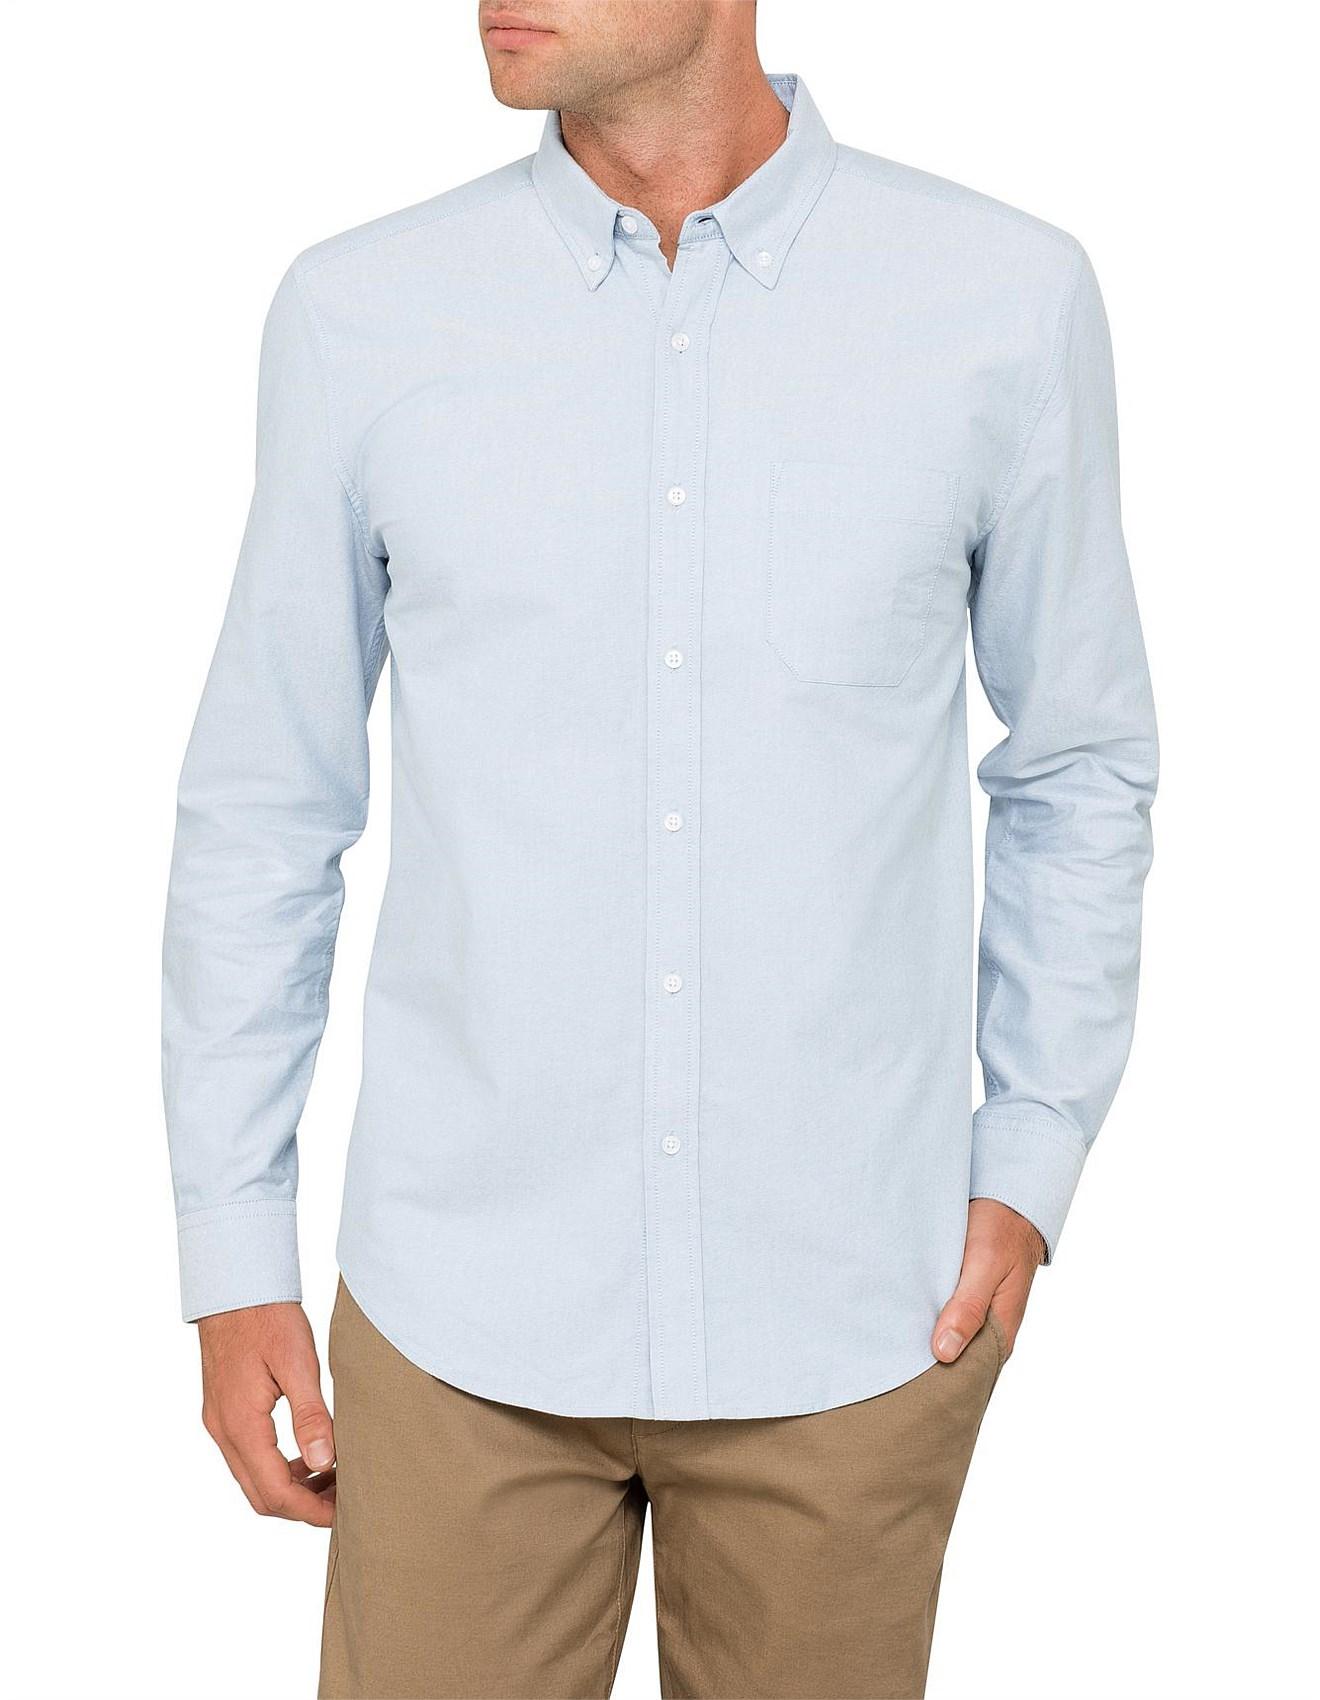 Men's Shirts | Casual Shirts & Dress Shirts | David Jones ...